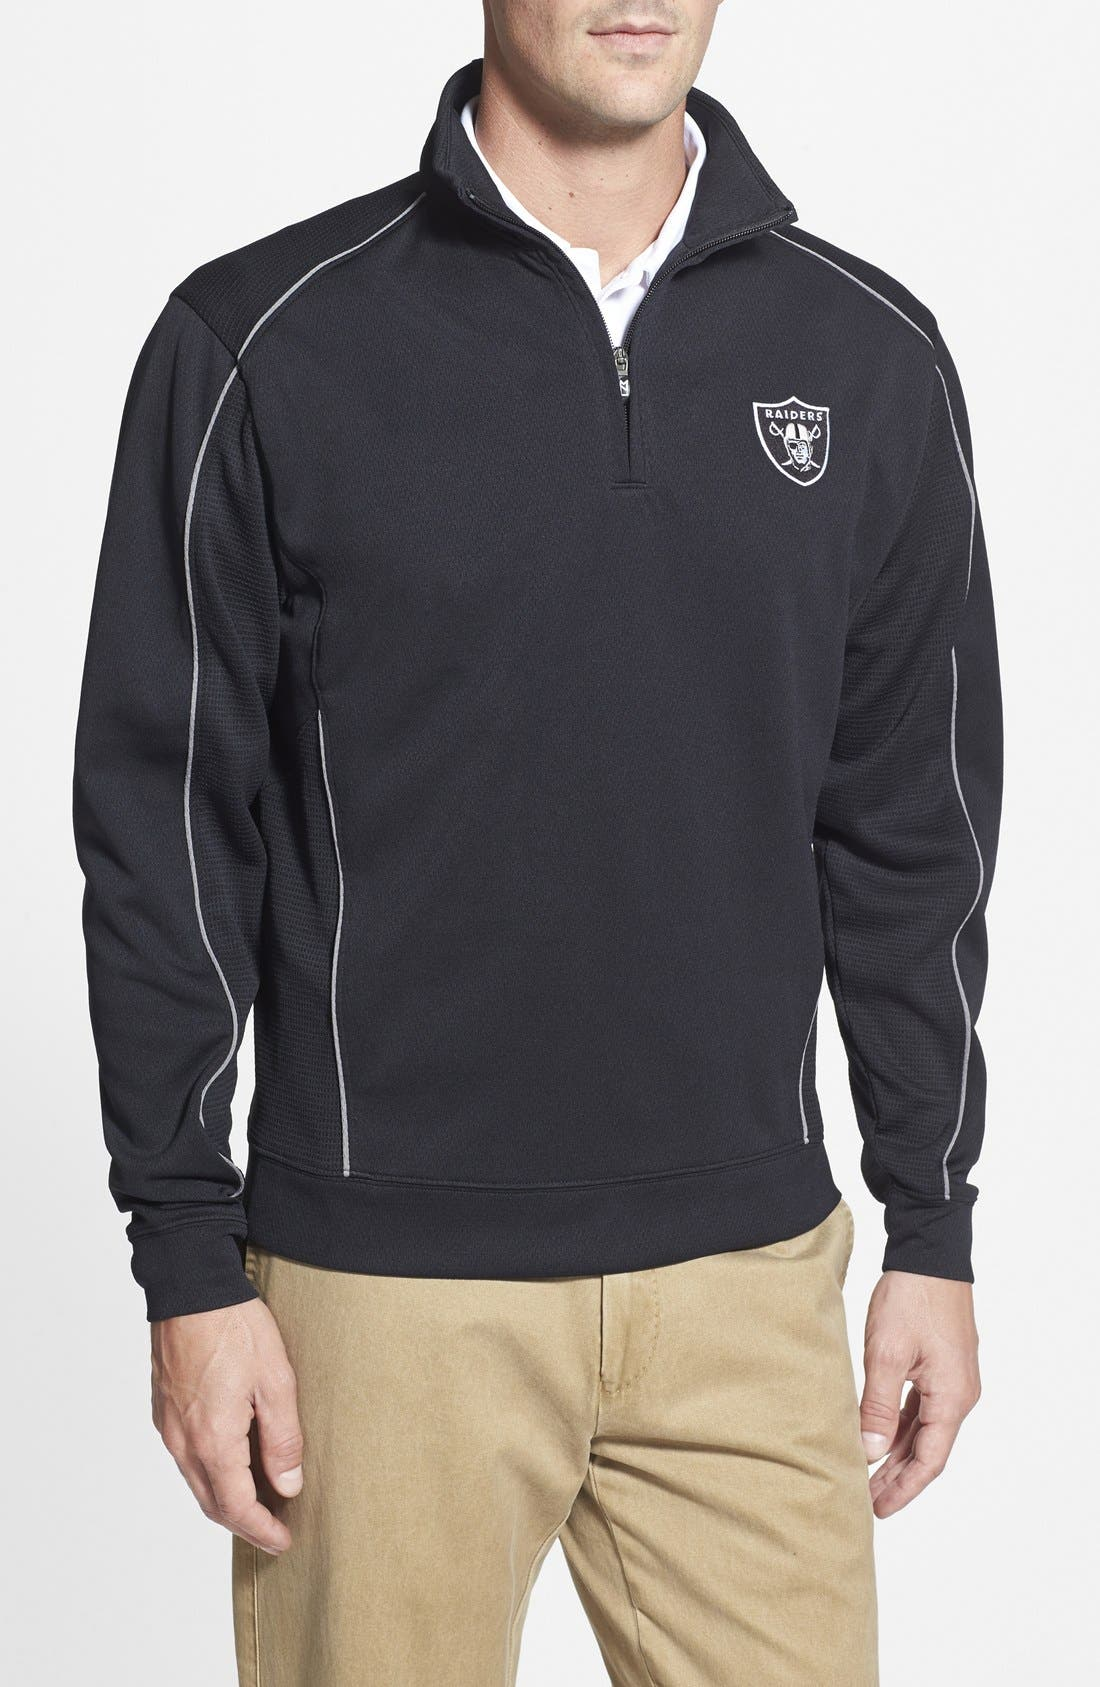 Main Image - Cutter & Buck Oakland Raiders - Edge DryTec Moisture Wicking Half Zip Pullover